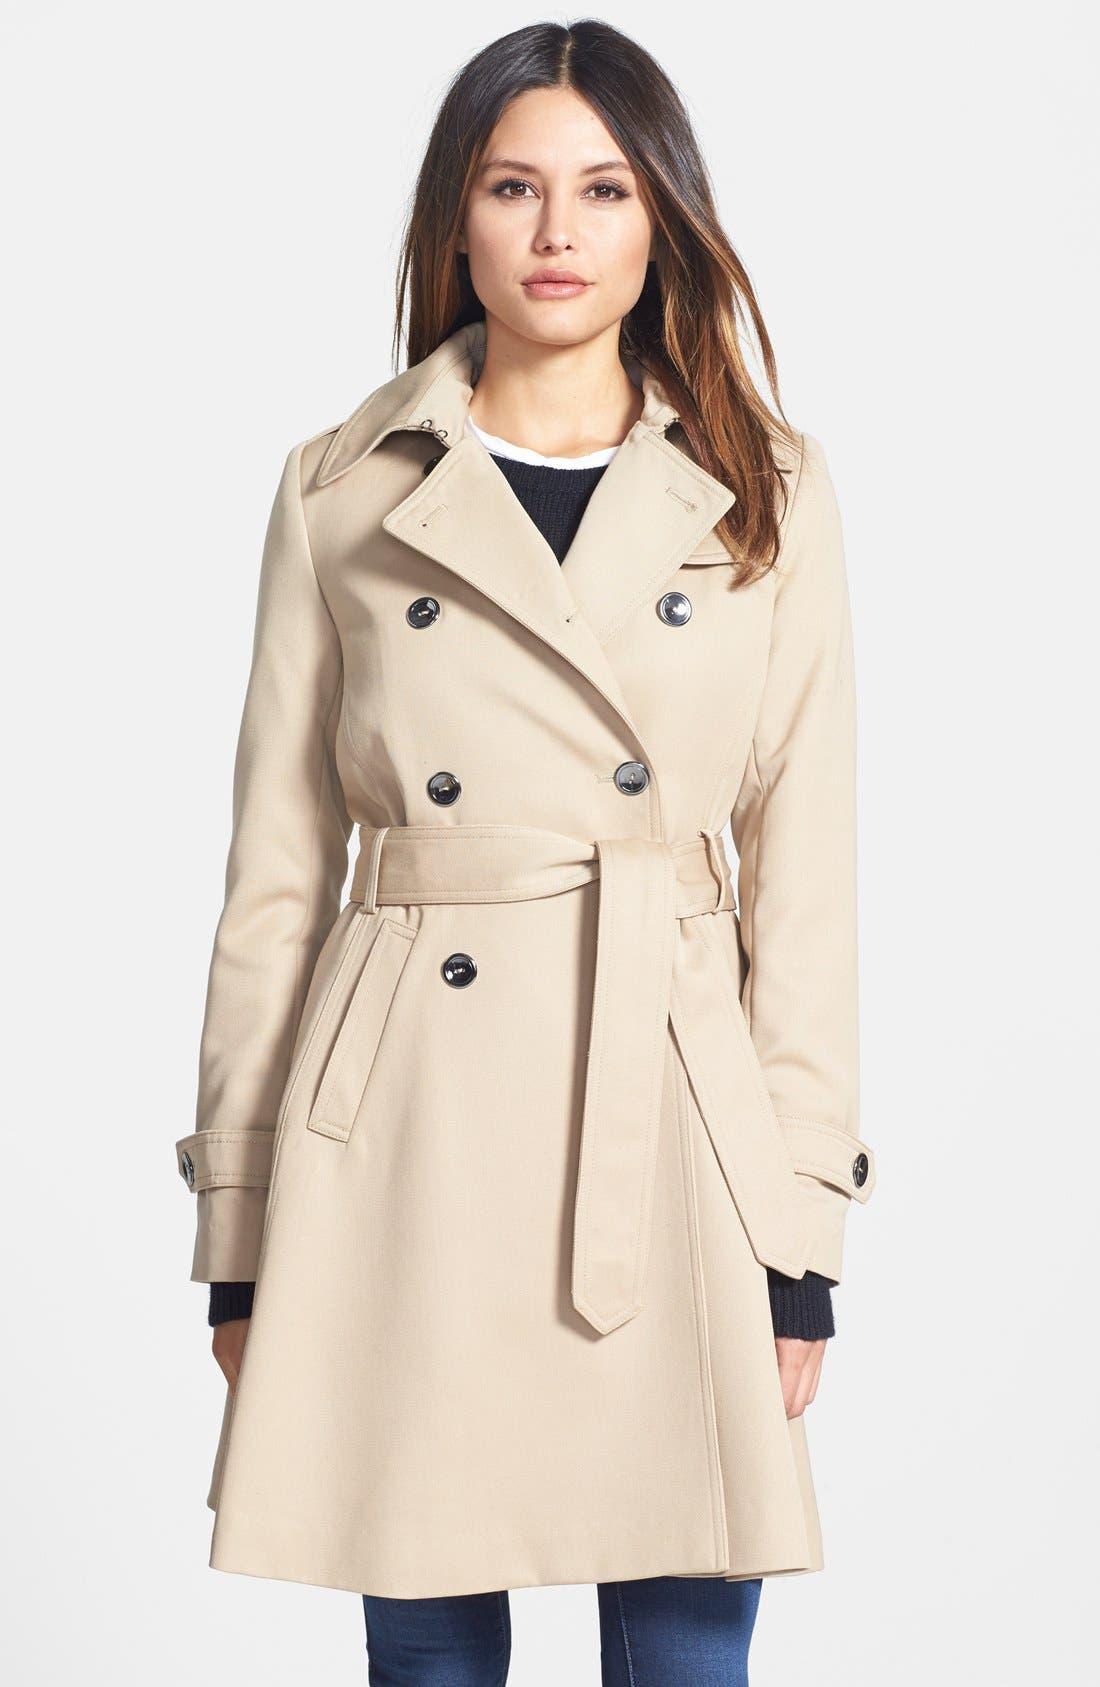 Alternate Image 1 Selected - Trina Turk 'Gwyneth' Flared Wool Gabardine Trench Coat (Regular & Petite)